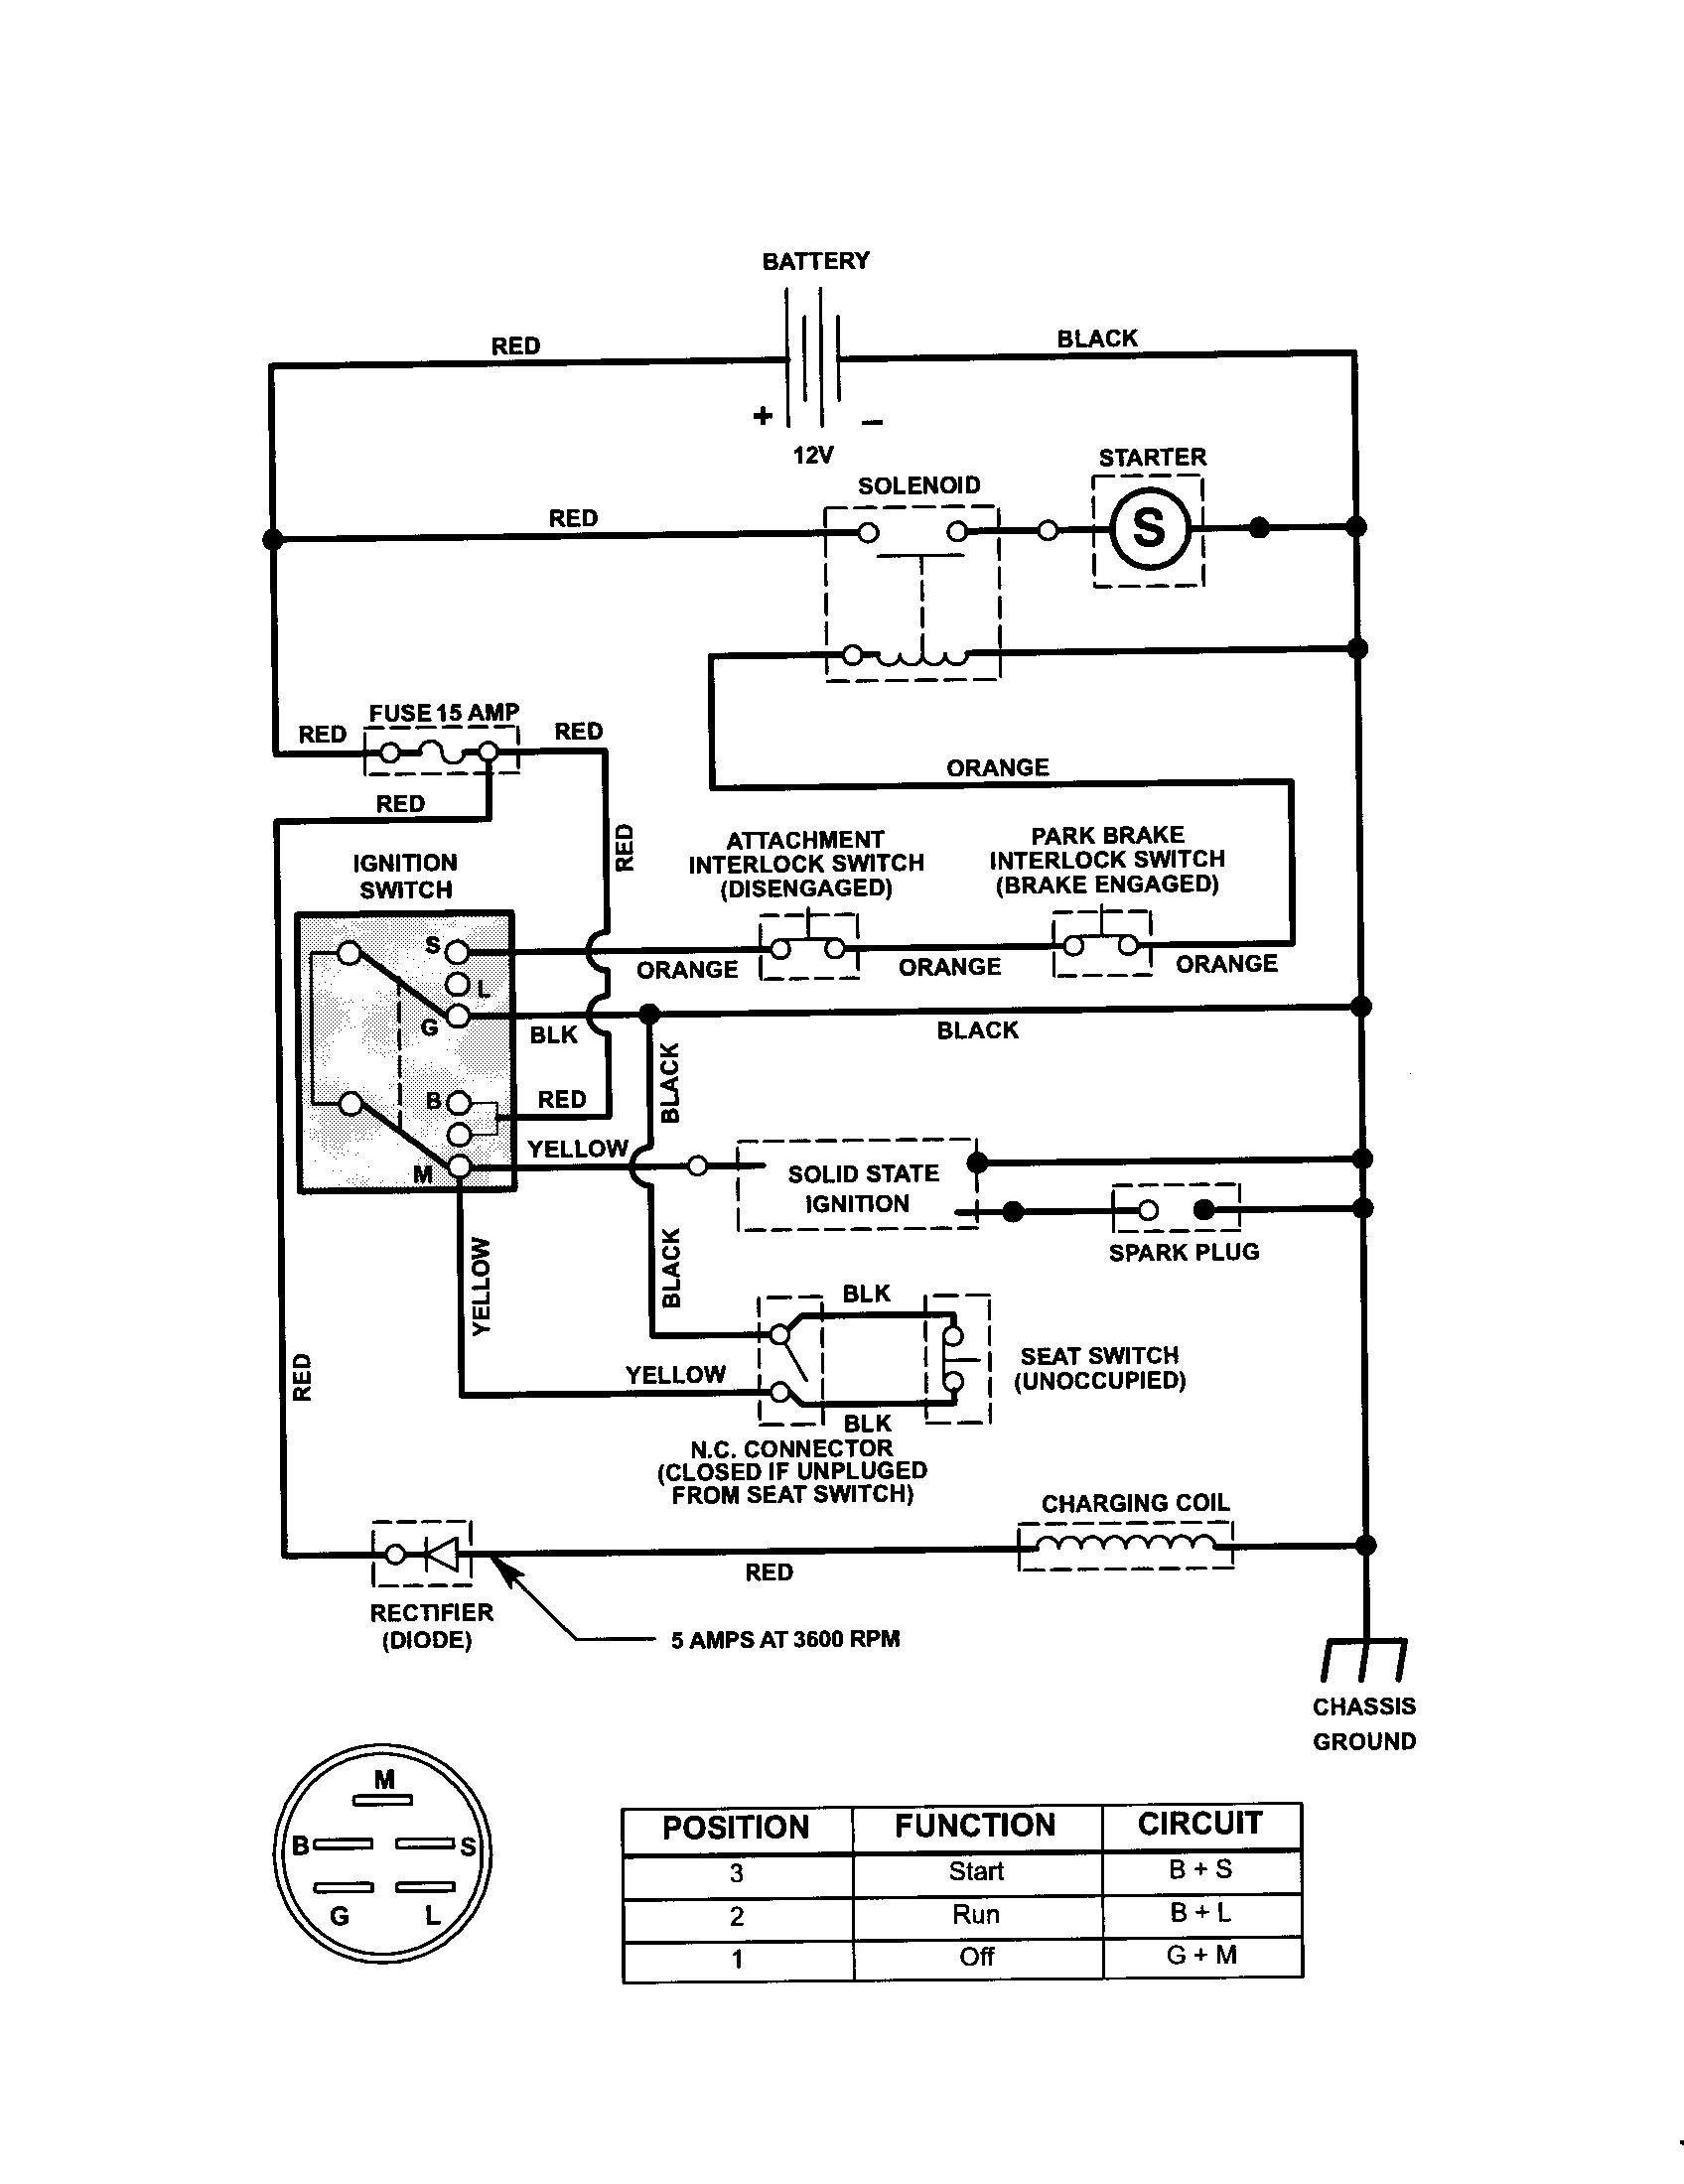 john deere model wiring diagram kgt starting circuits colored inside